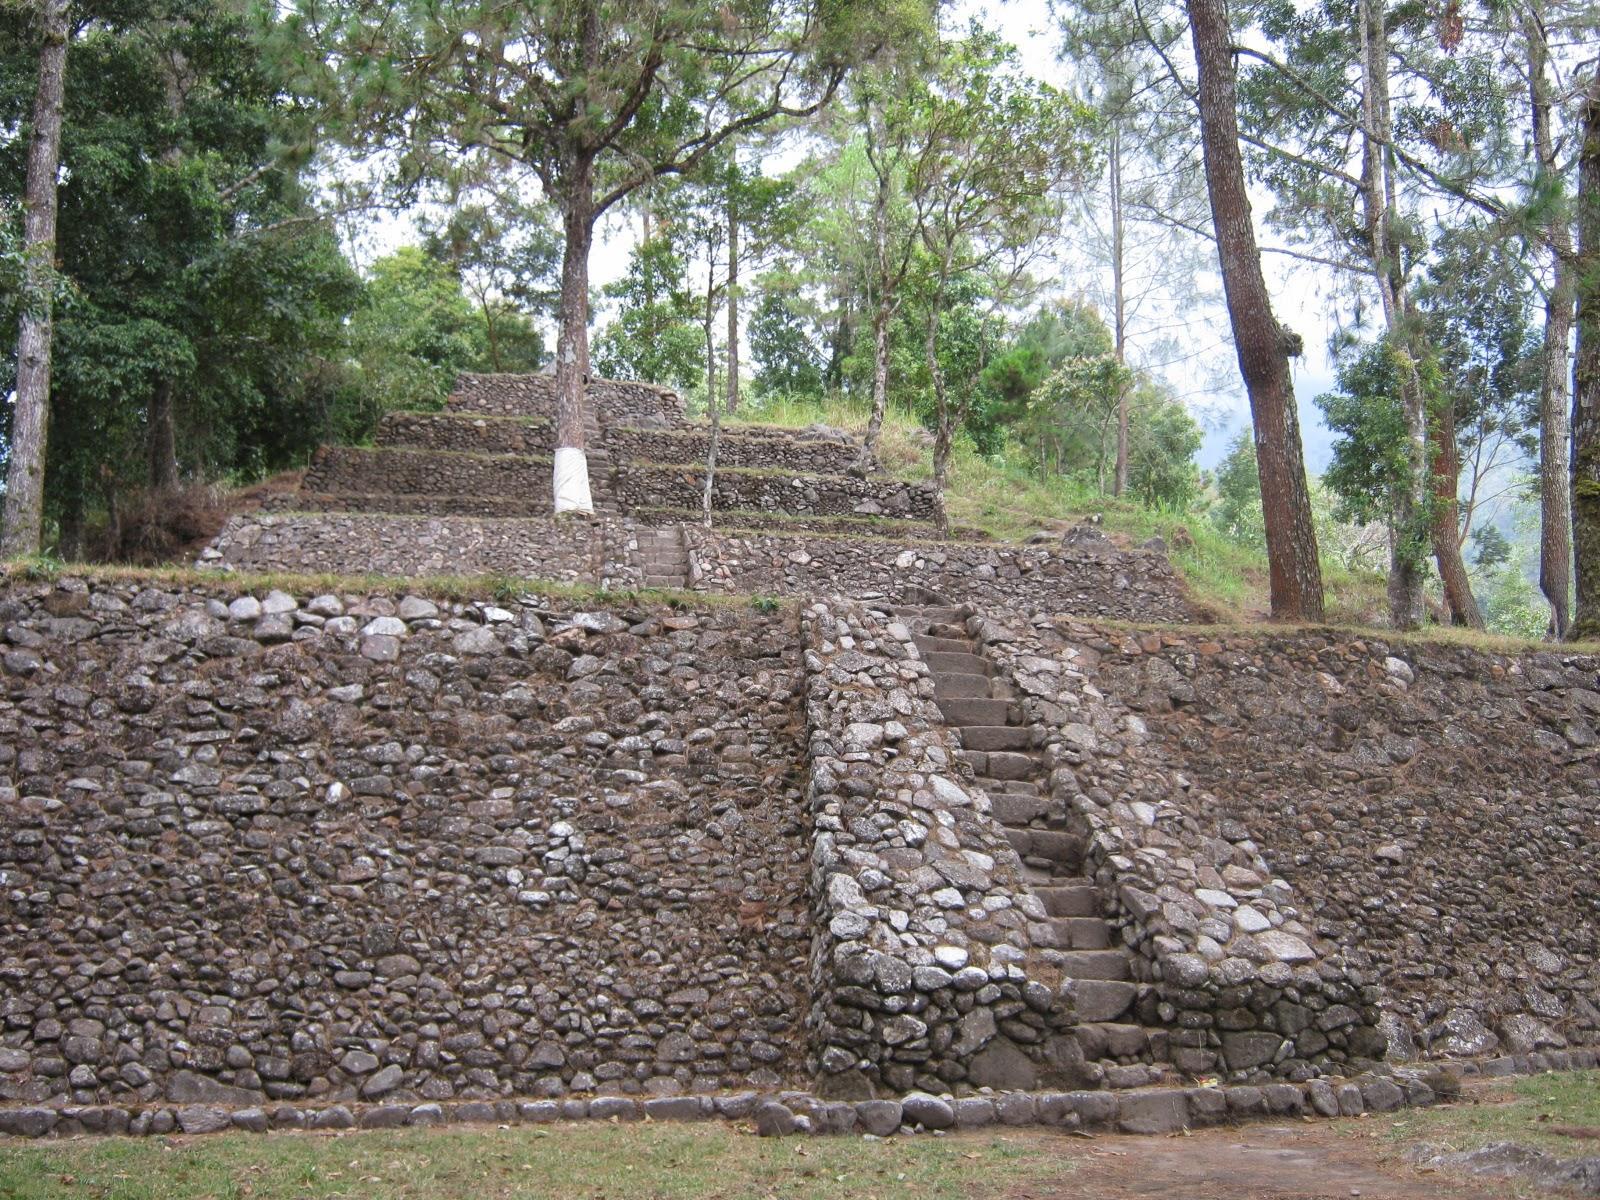 Candi Kethek Tersembunyi Lereng Gunung Lawu Mundakarama Setelah Mengunjungi Cetho